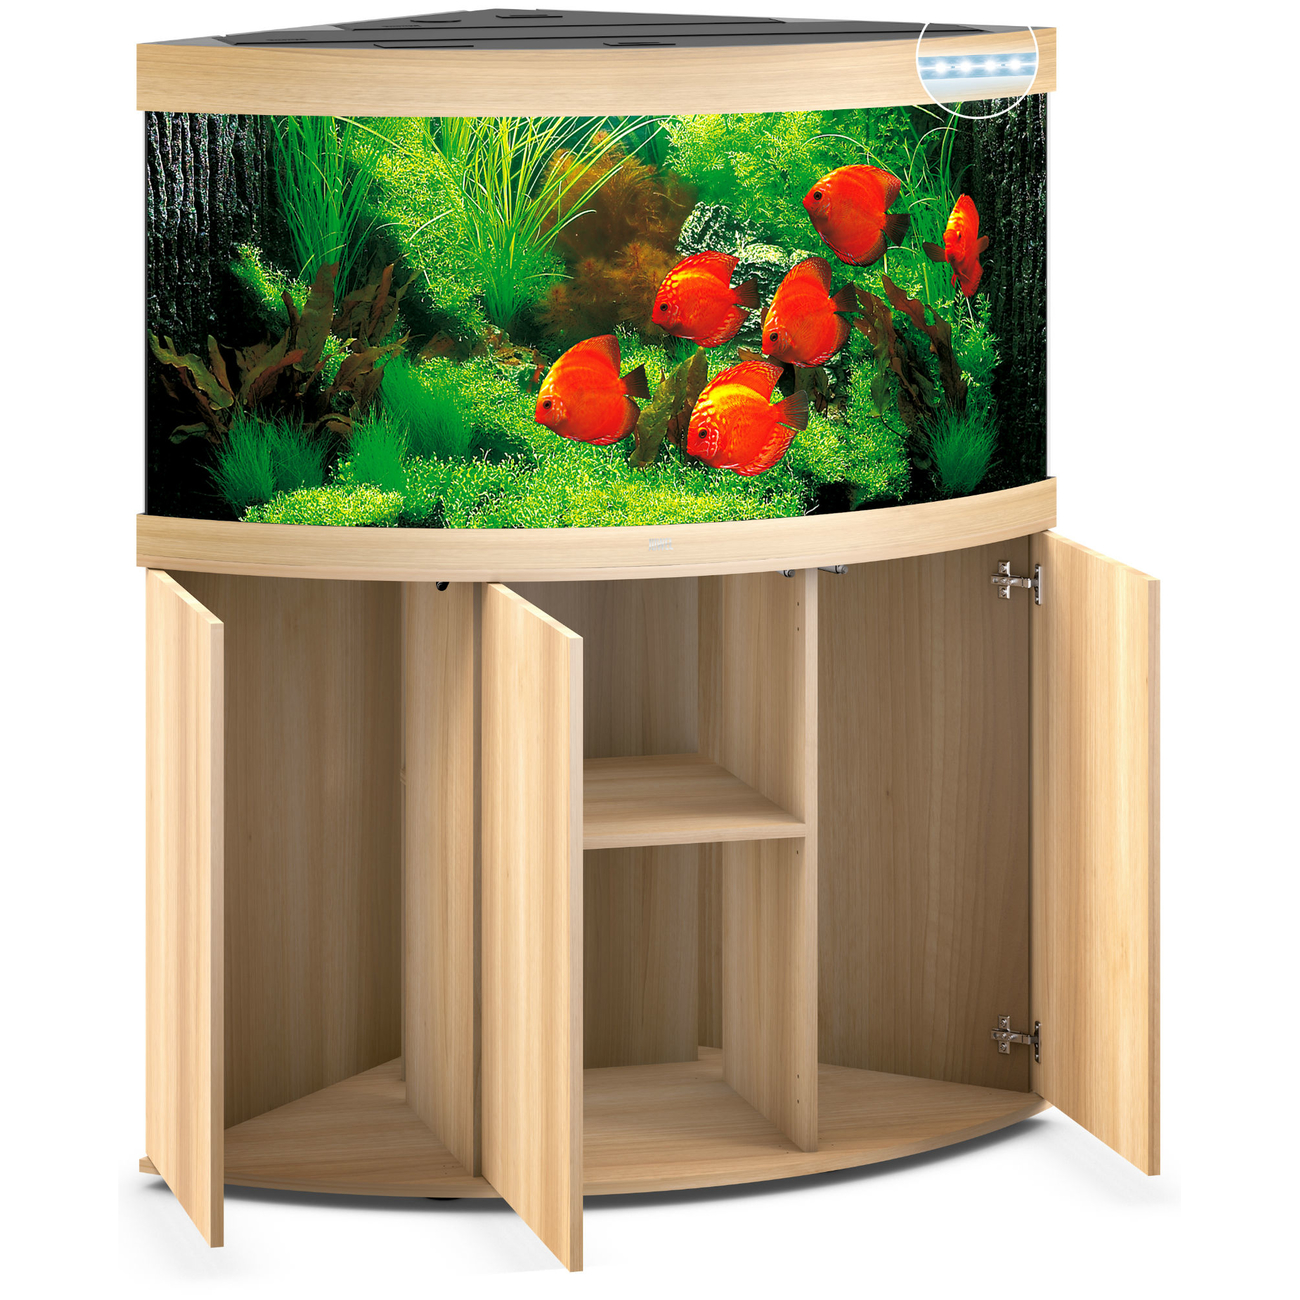 Juwel Trigon 350 LED Eck-Aquarium mit Unterschrank, Bild 12